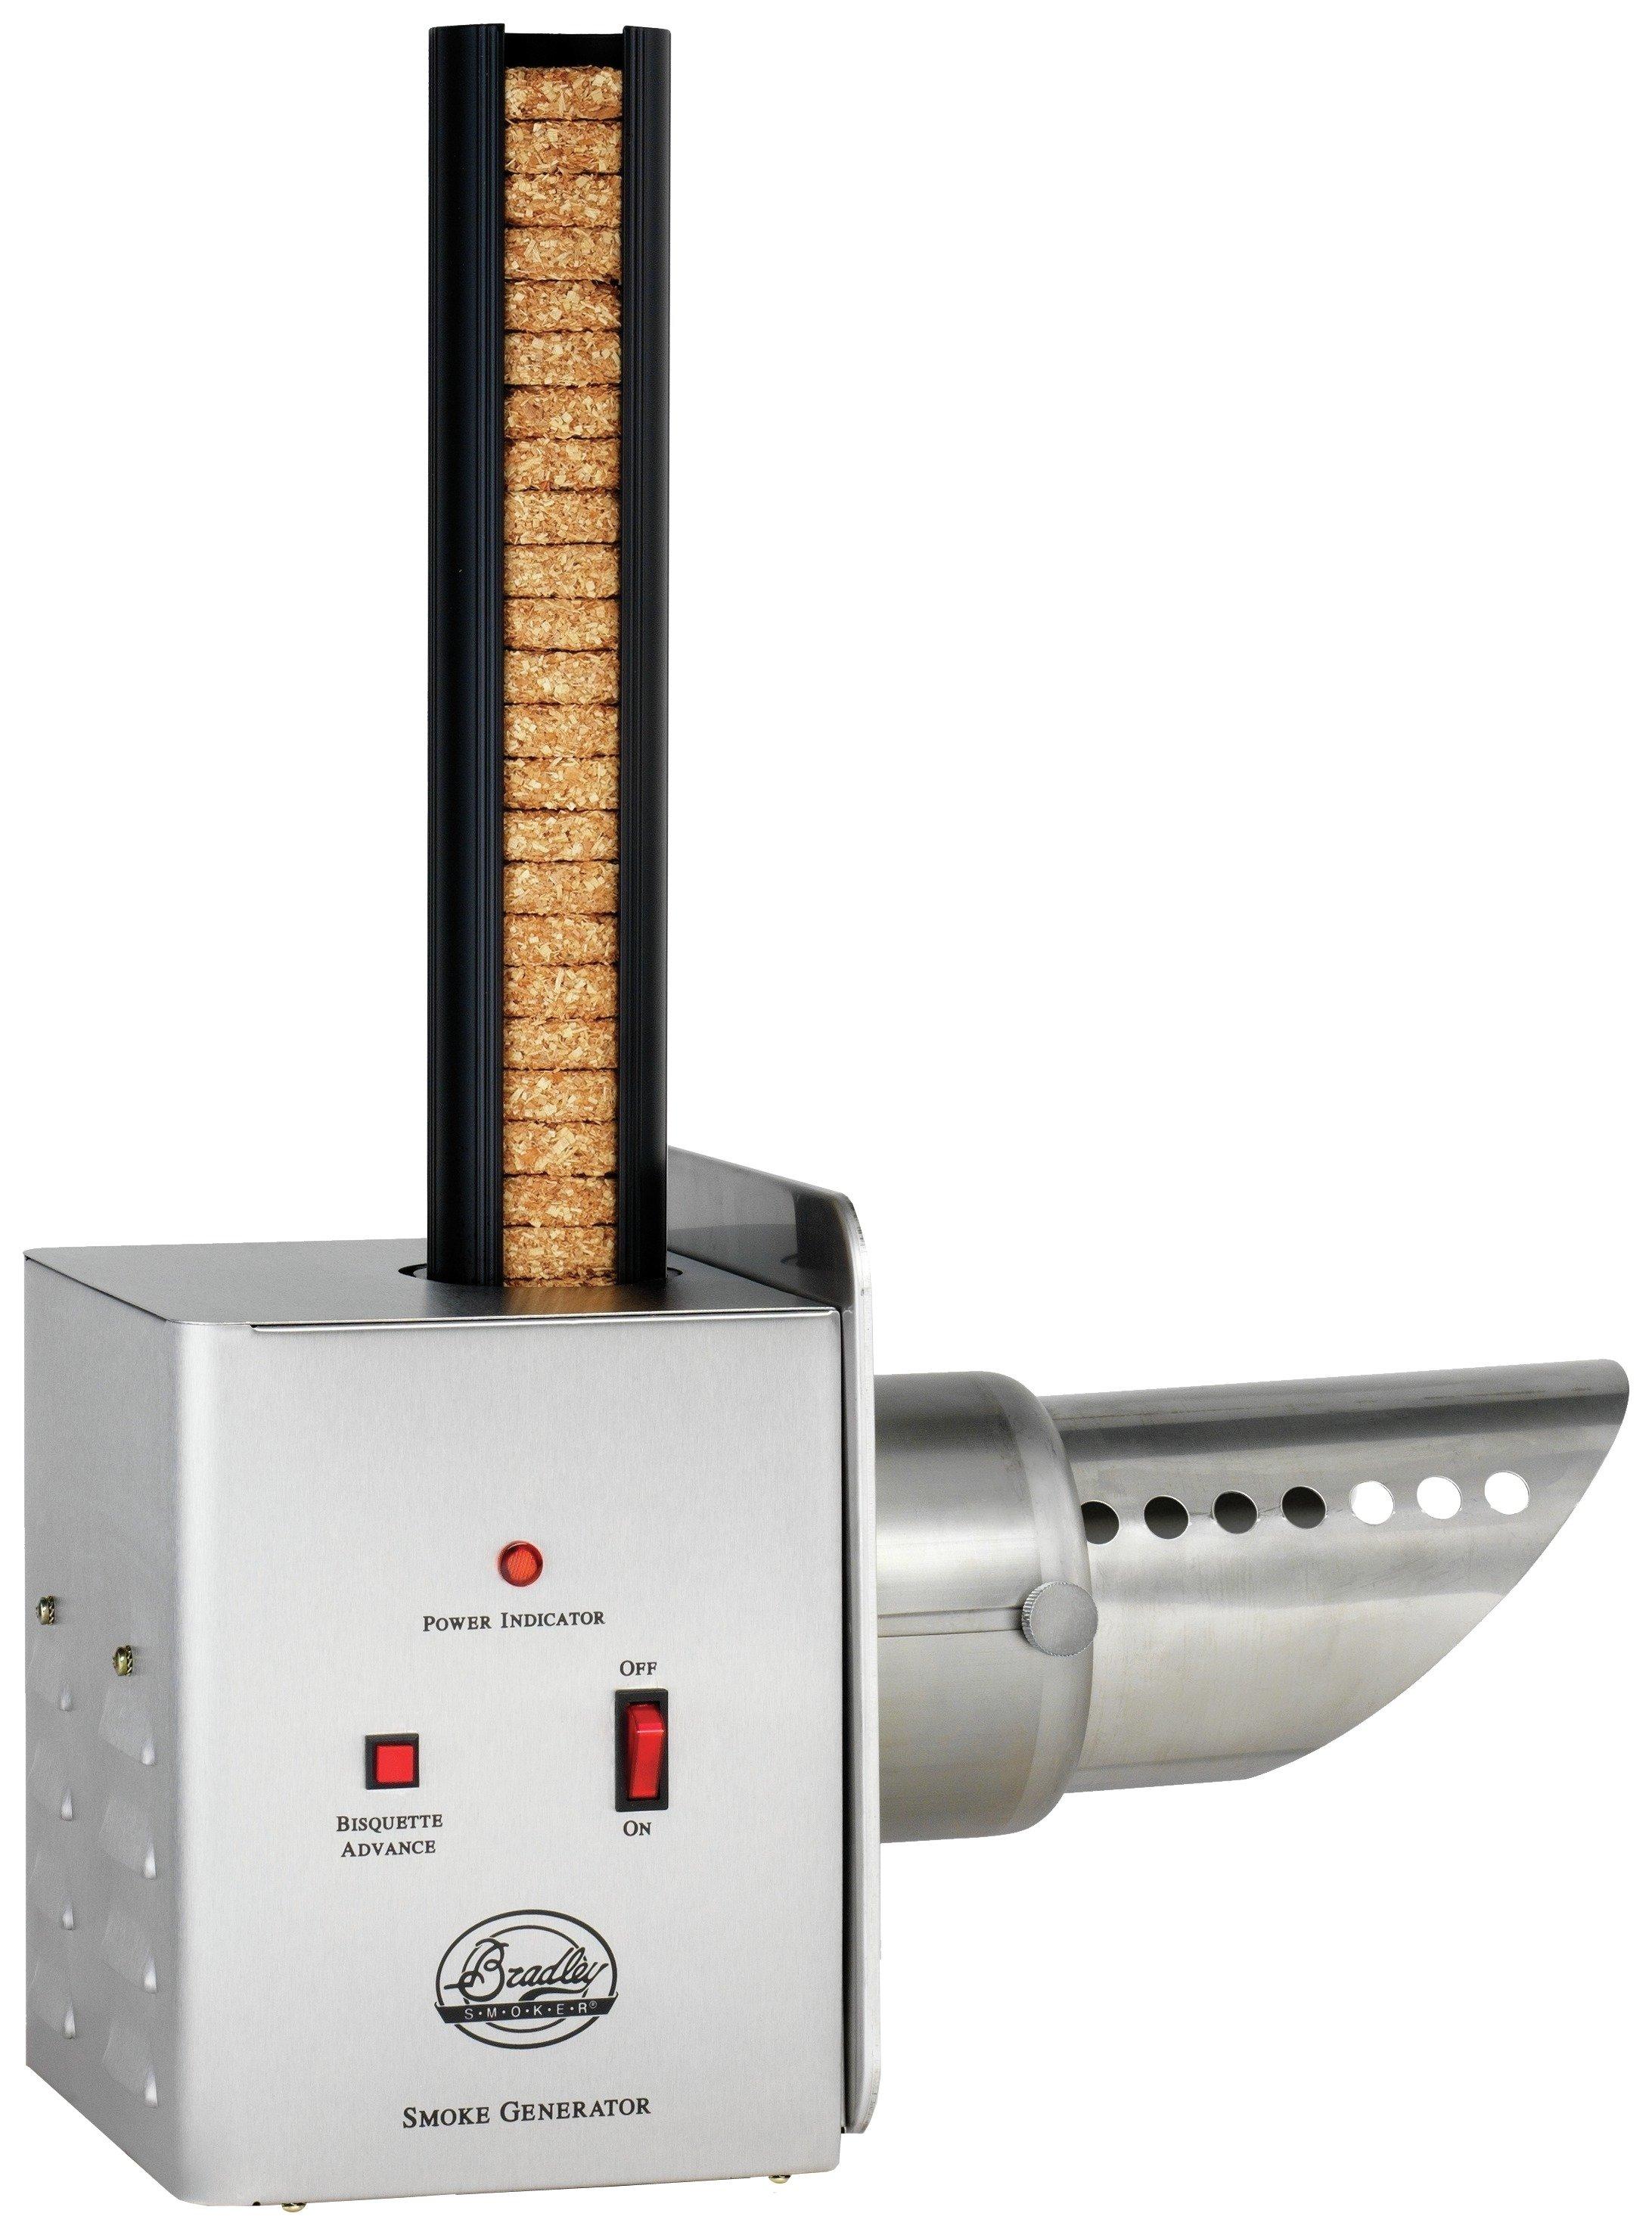 Bradley Smoker BTSGCE240 Smoke Generator with Adaptor. at Argos